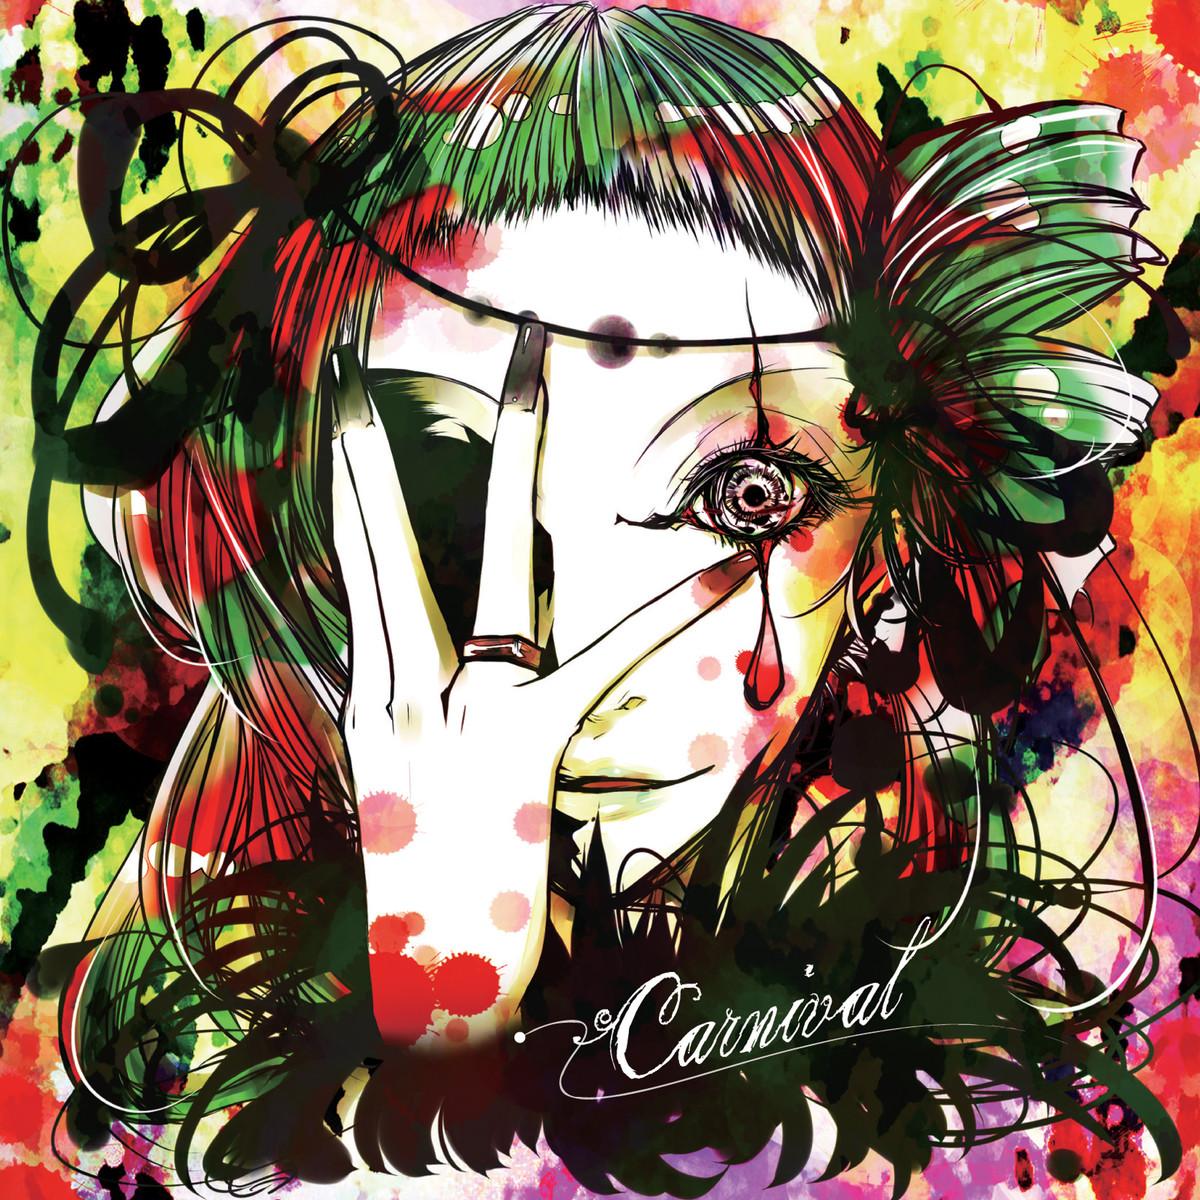 Carnival (album)